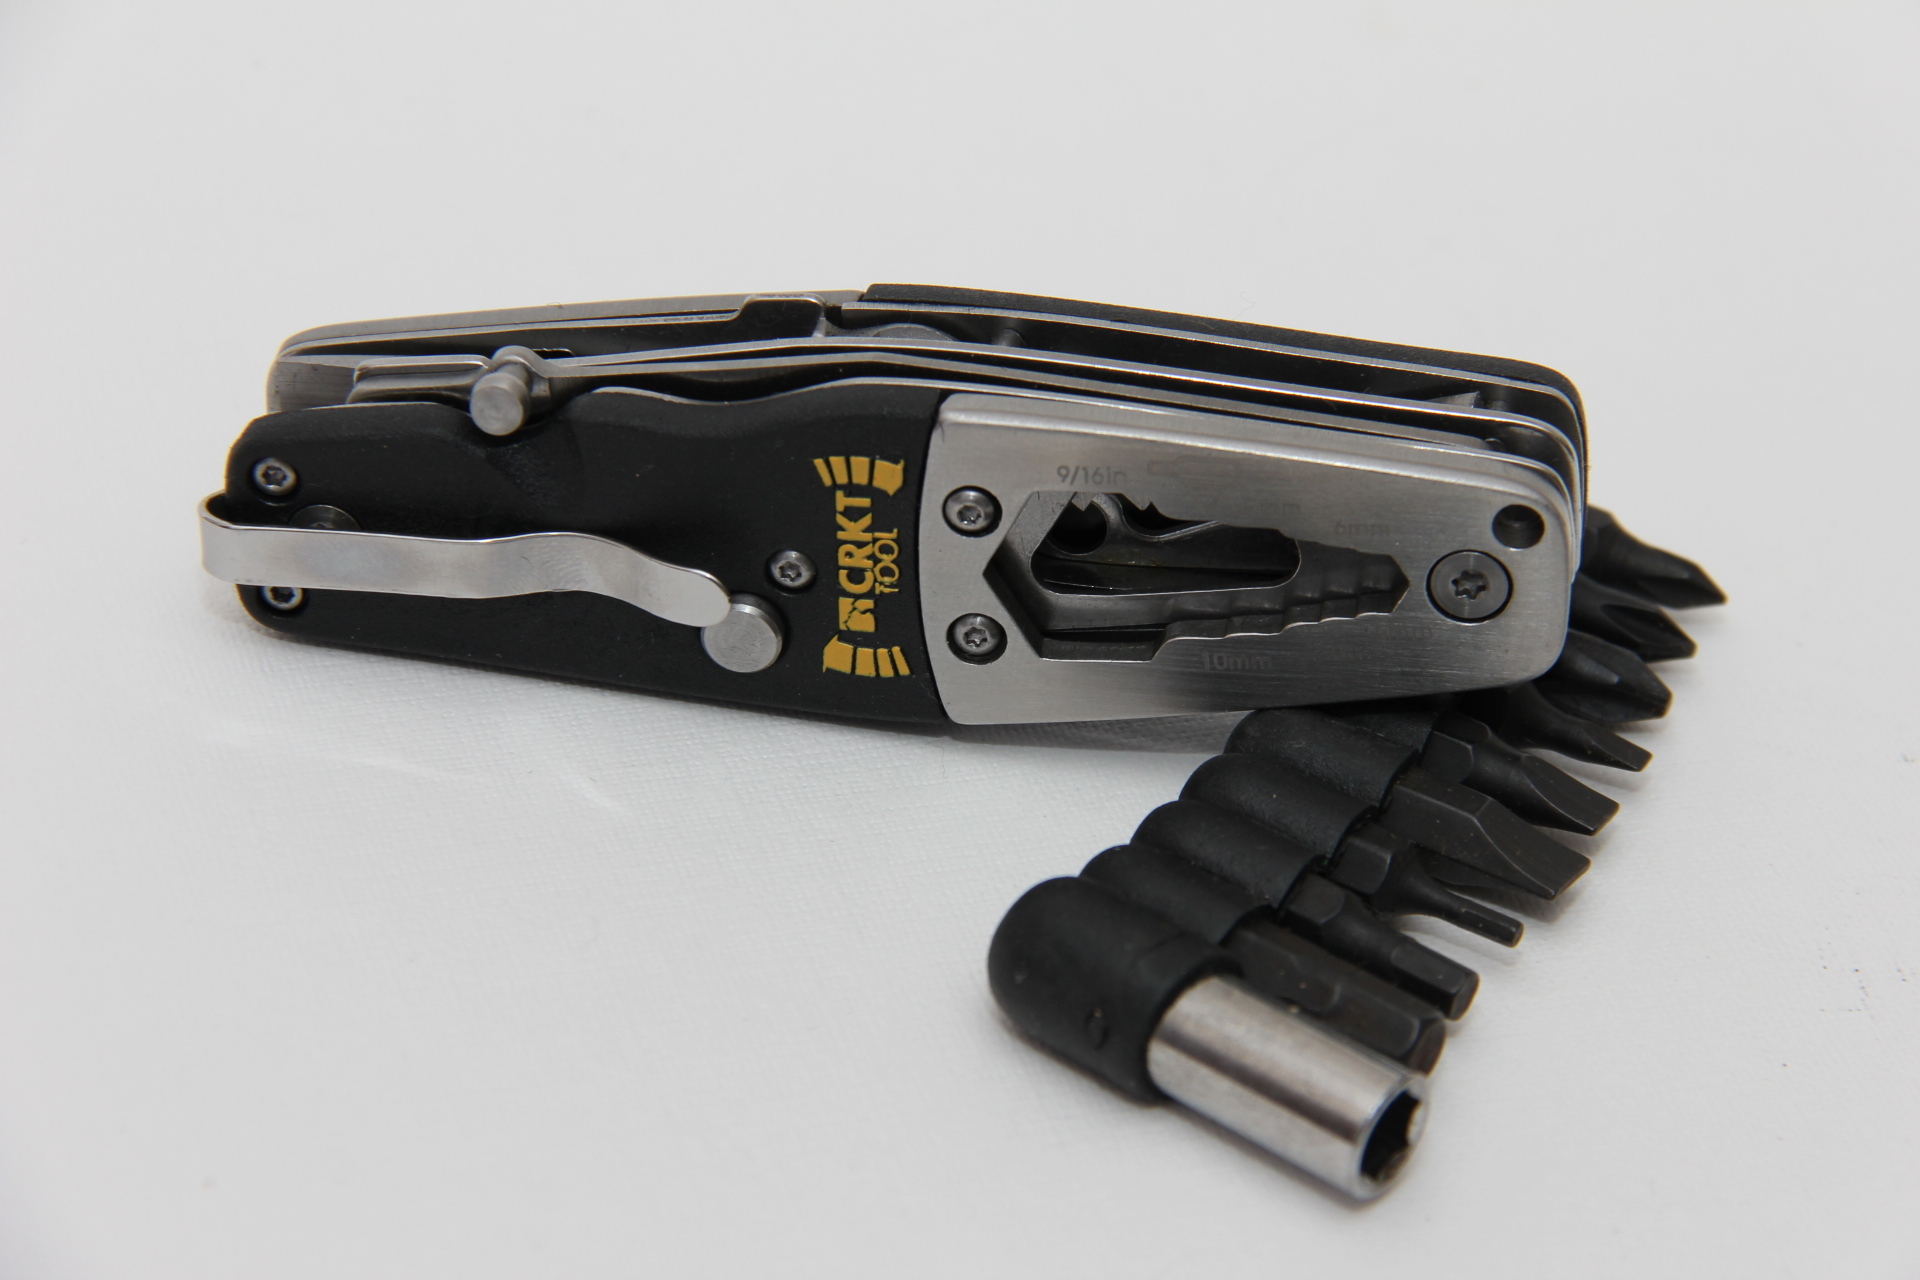 Мультитул CRKT tool 9200 - фотография